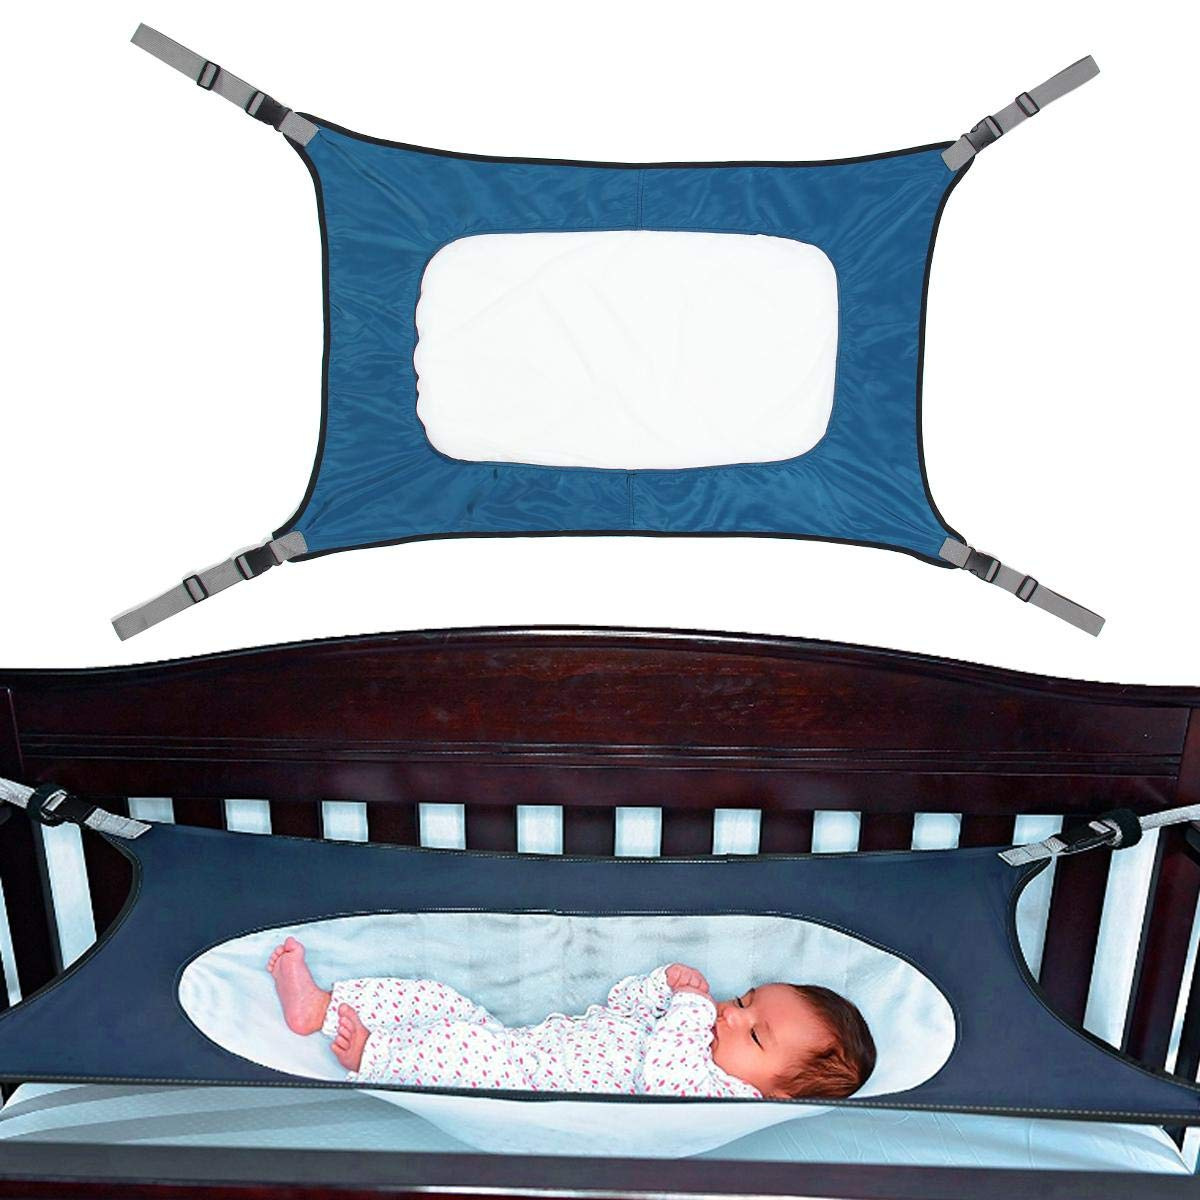 Crib Hammock, Aolvo Baby Hammock for Crib Heavy Duty Elastic Newborn Nursery Hammock Bed Comfortable Universal Sleeping Hammock with Adjustable Straps for Infant Bassinet Wombs, 0-12 Months (Blue)